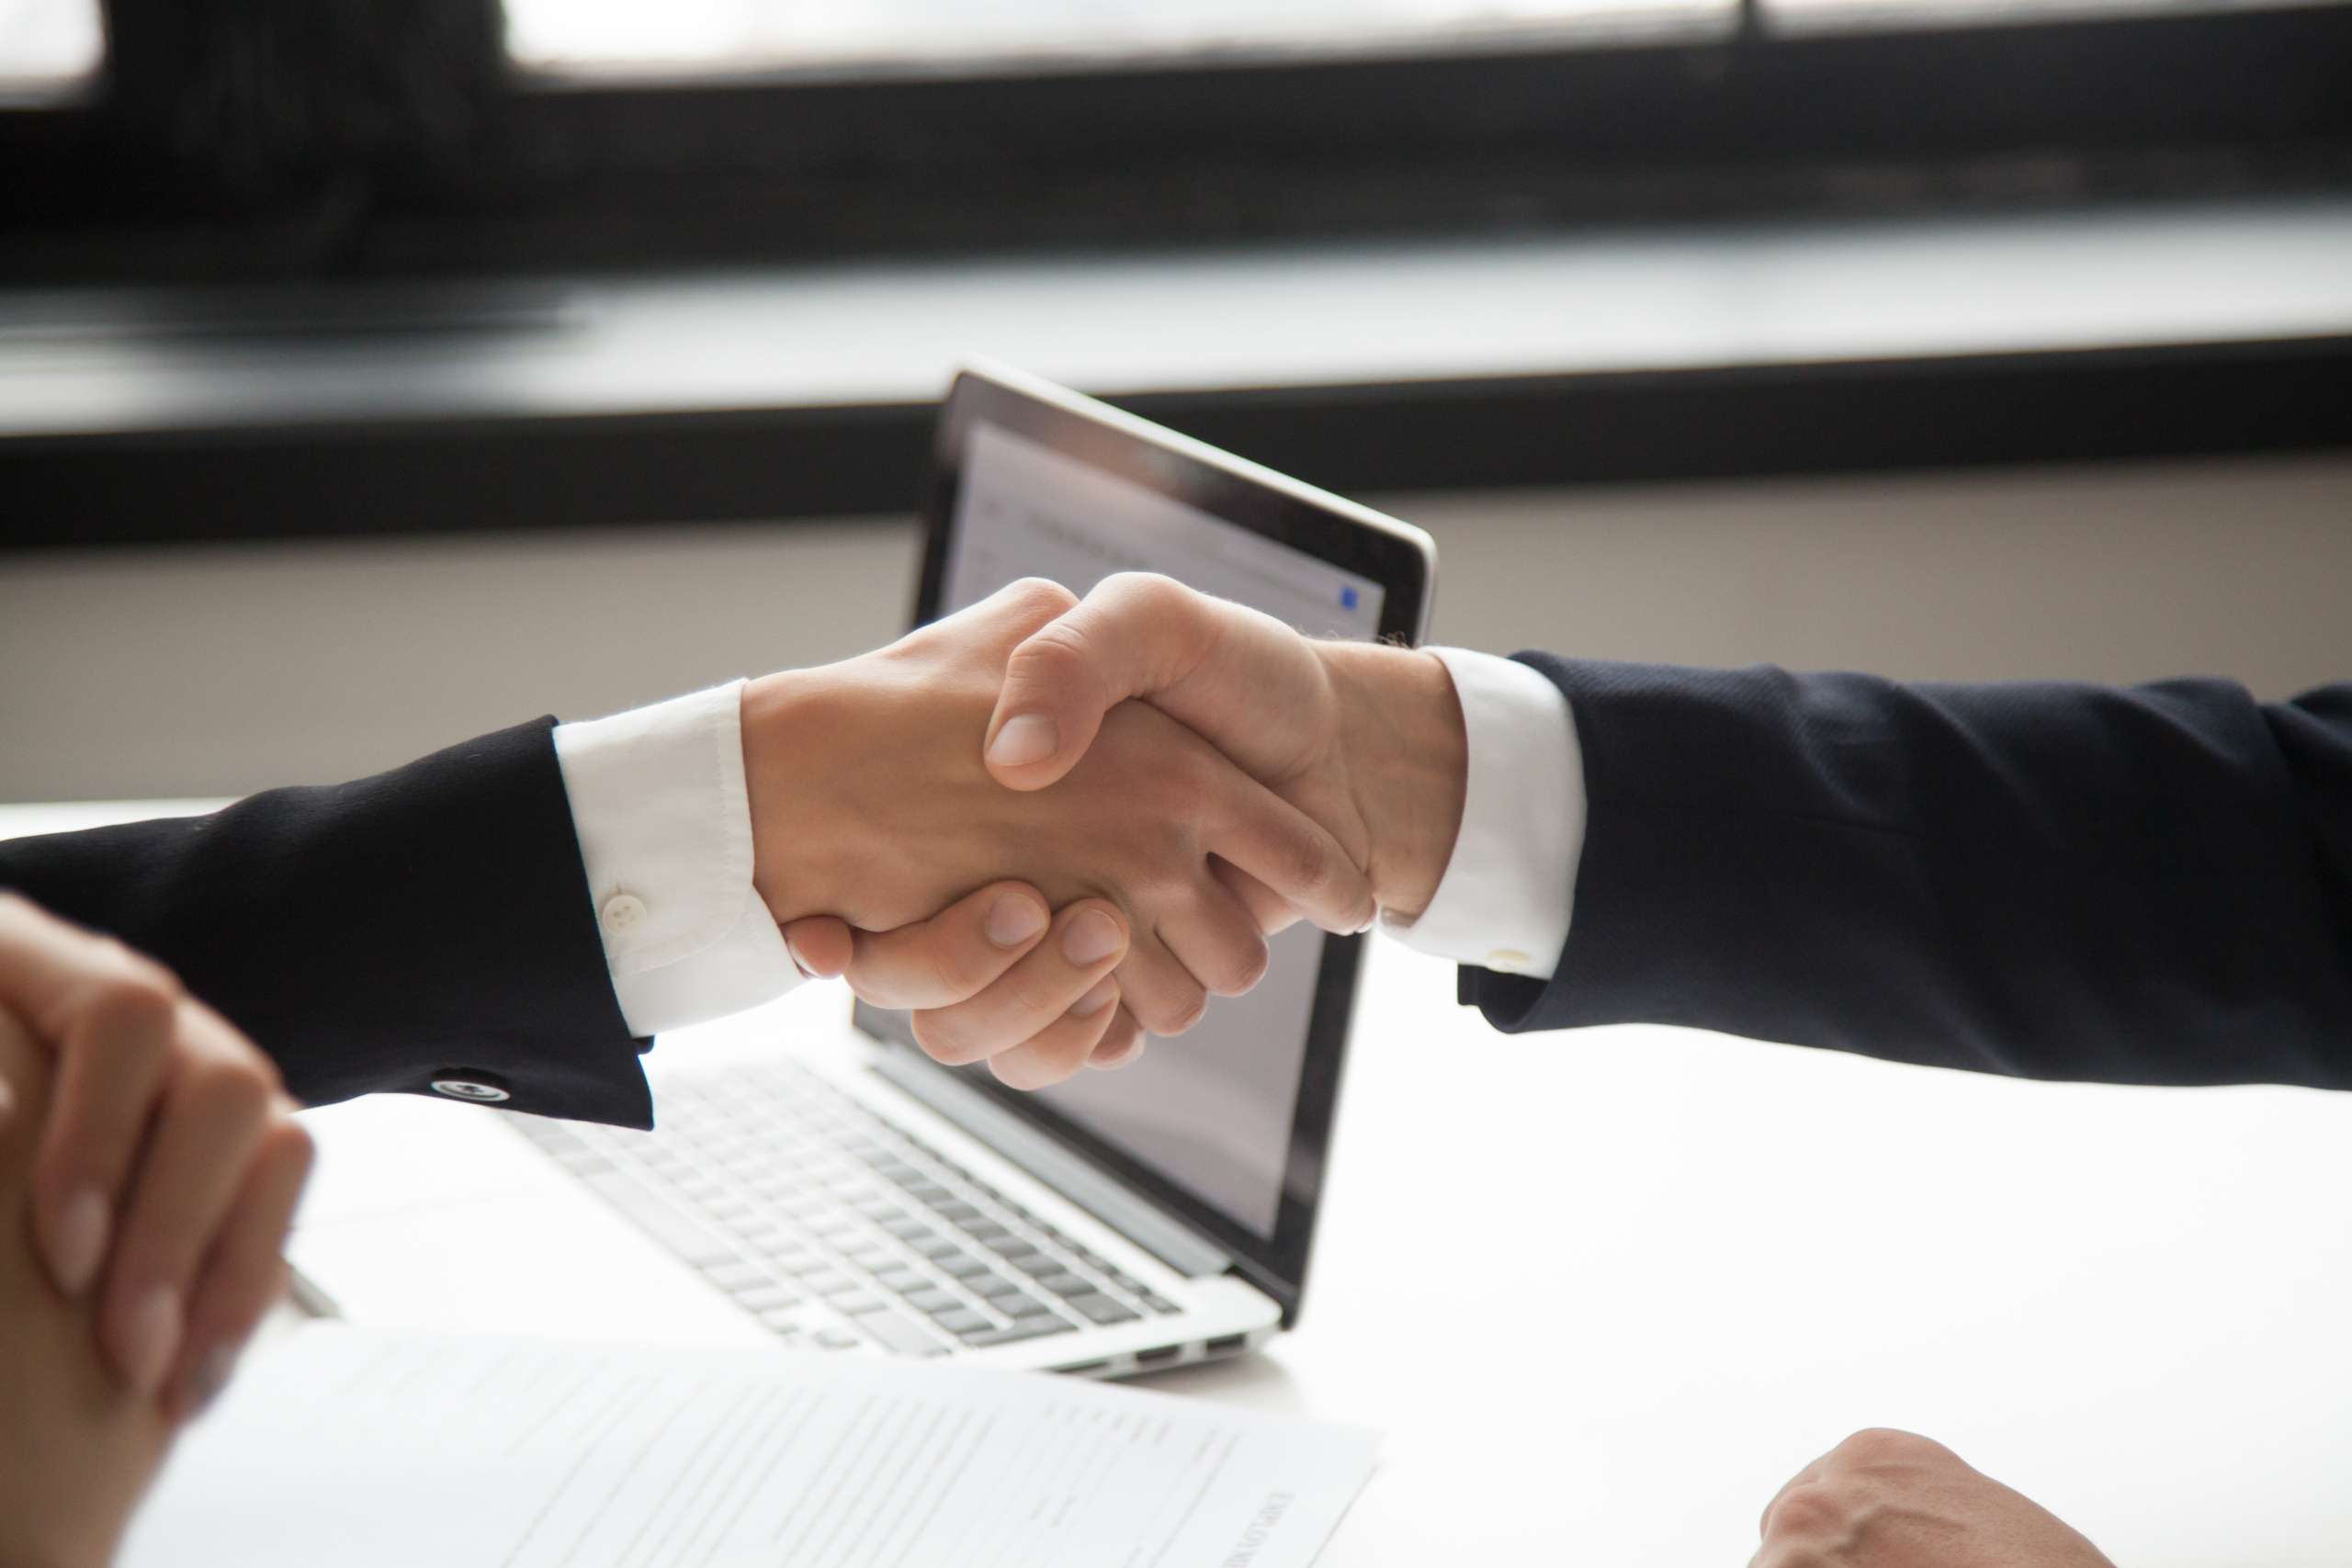 Verkoopopleiding | Dubbele driehoek verkoopopleiding | Reachers